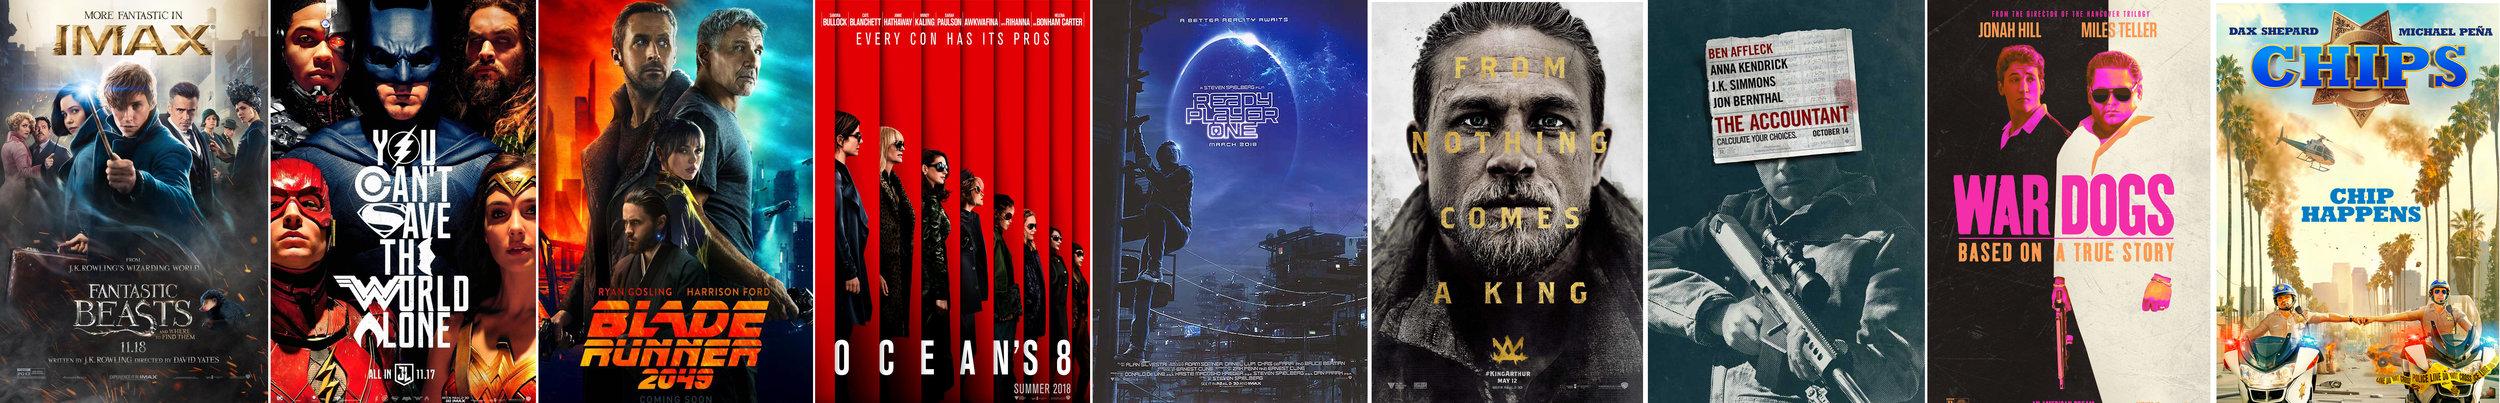 WB Films Layout.jpg